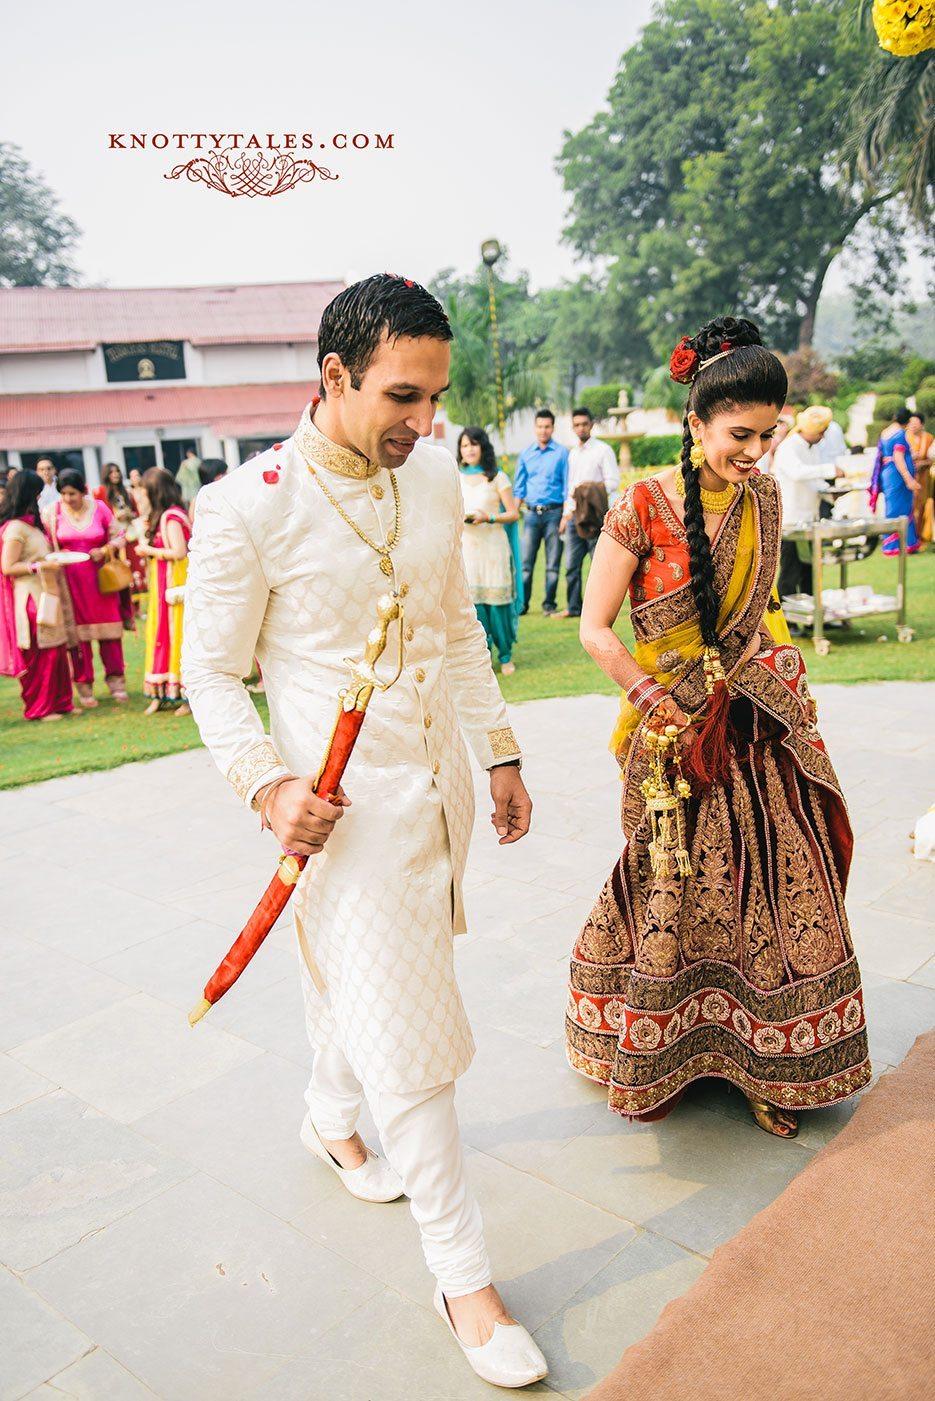 Gursimran-Sheleja-Wedding-Marriage-Knottytales-Naina-Indian-Wedding-Photography-45.jpg